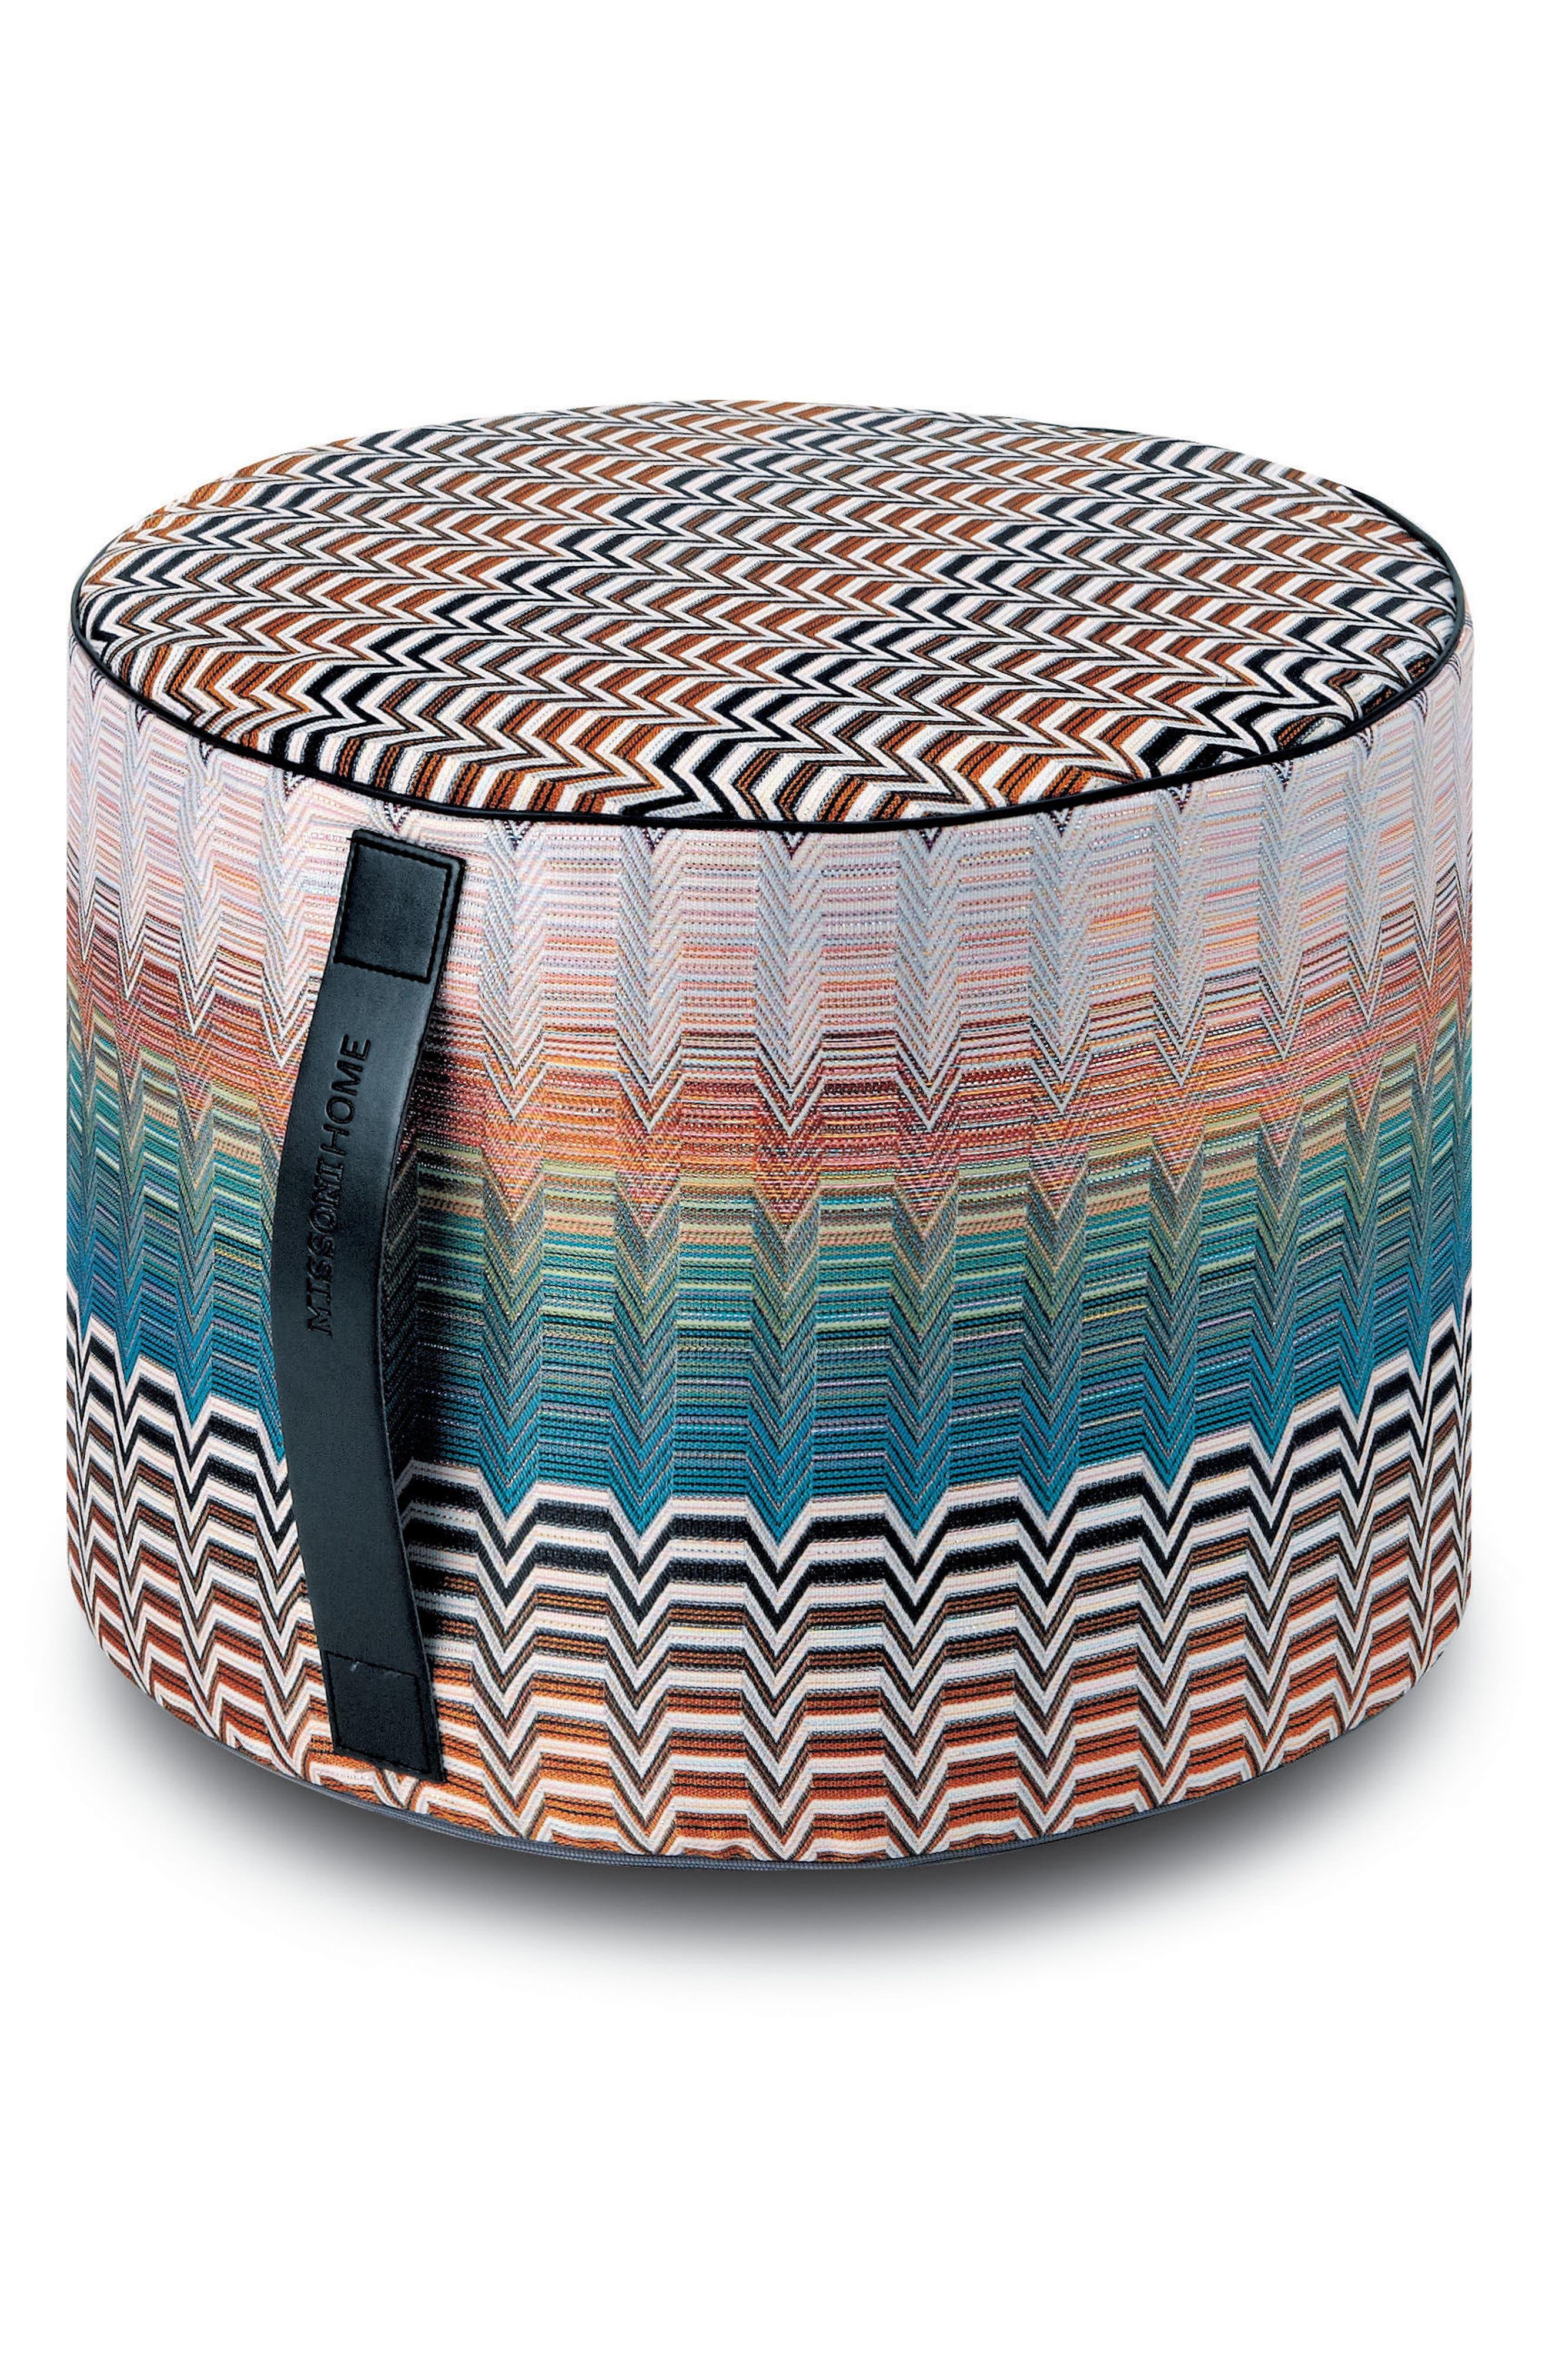 Santa Fe Seattle Cylindrical Floor Pouf,                             Main thumbnail 1, color,                             440